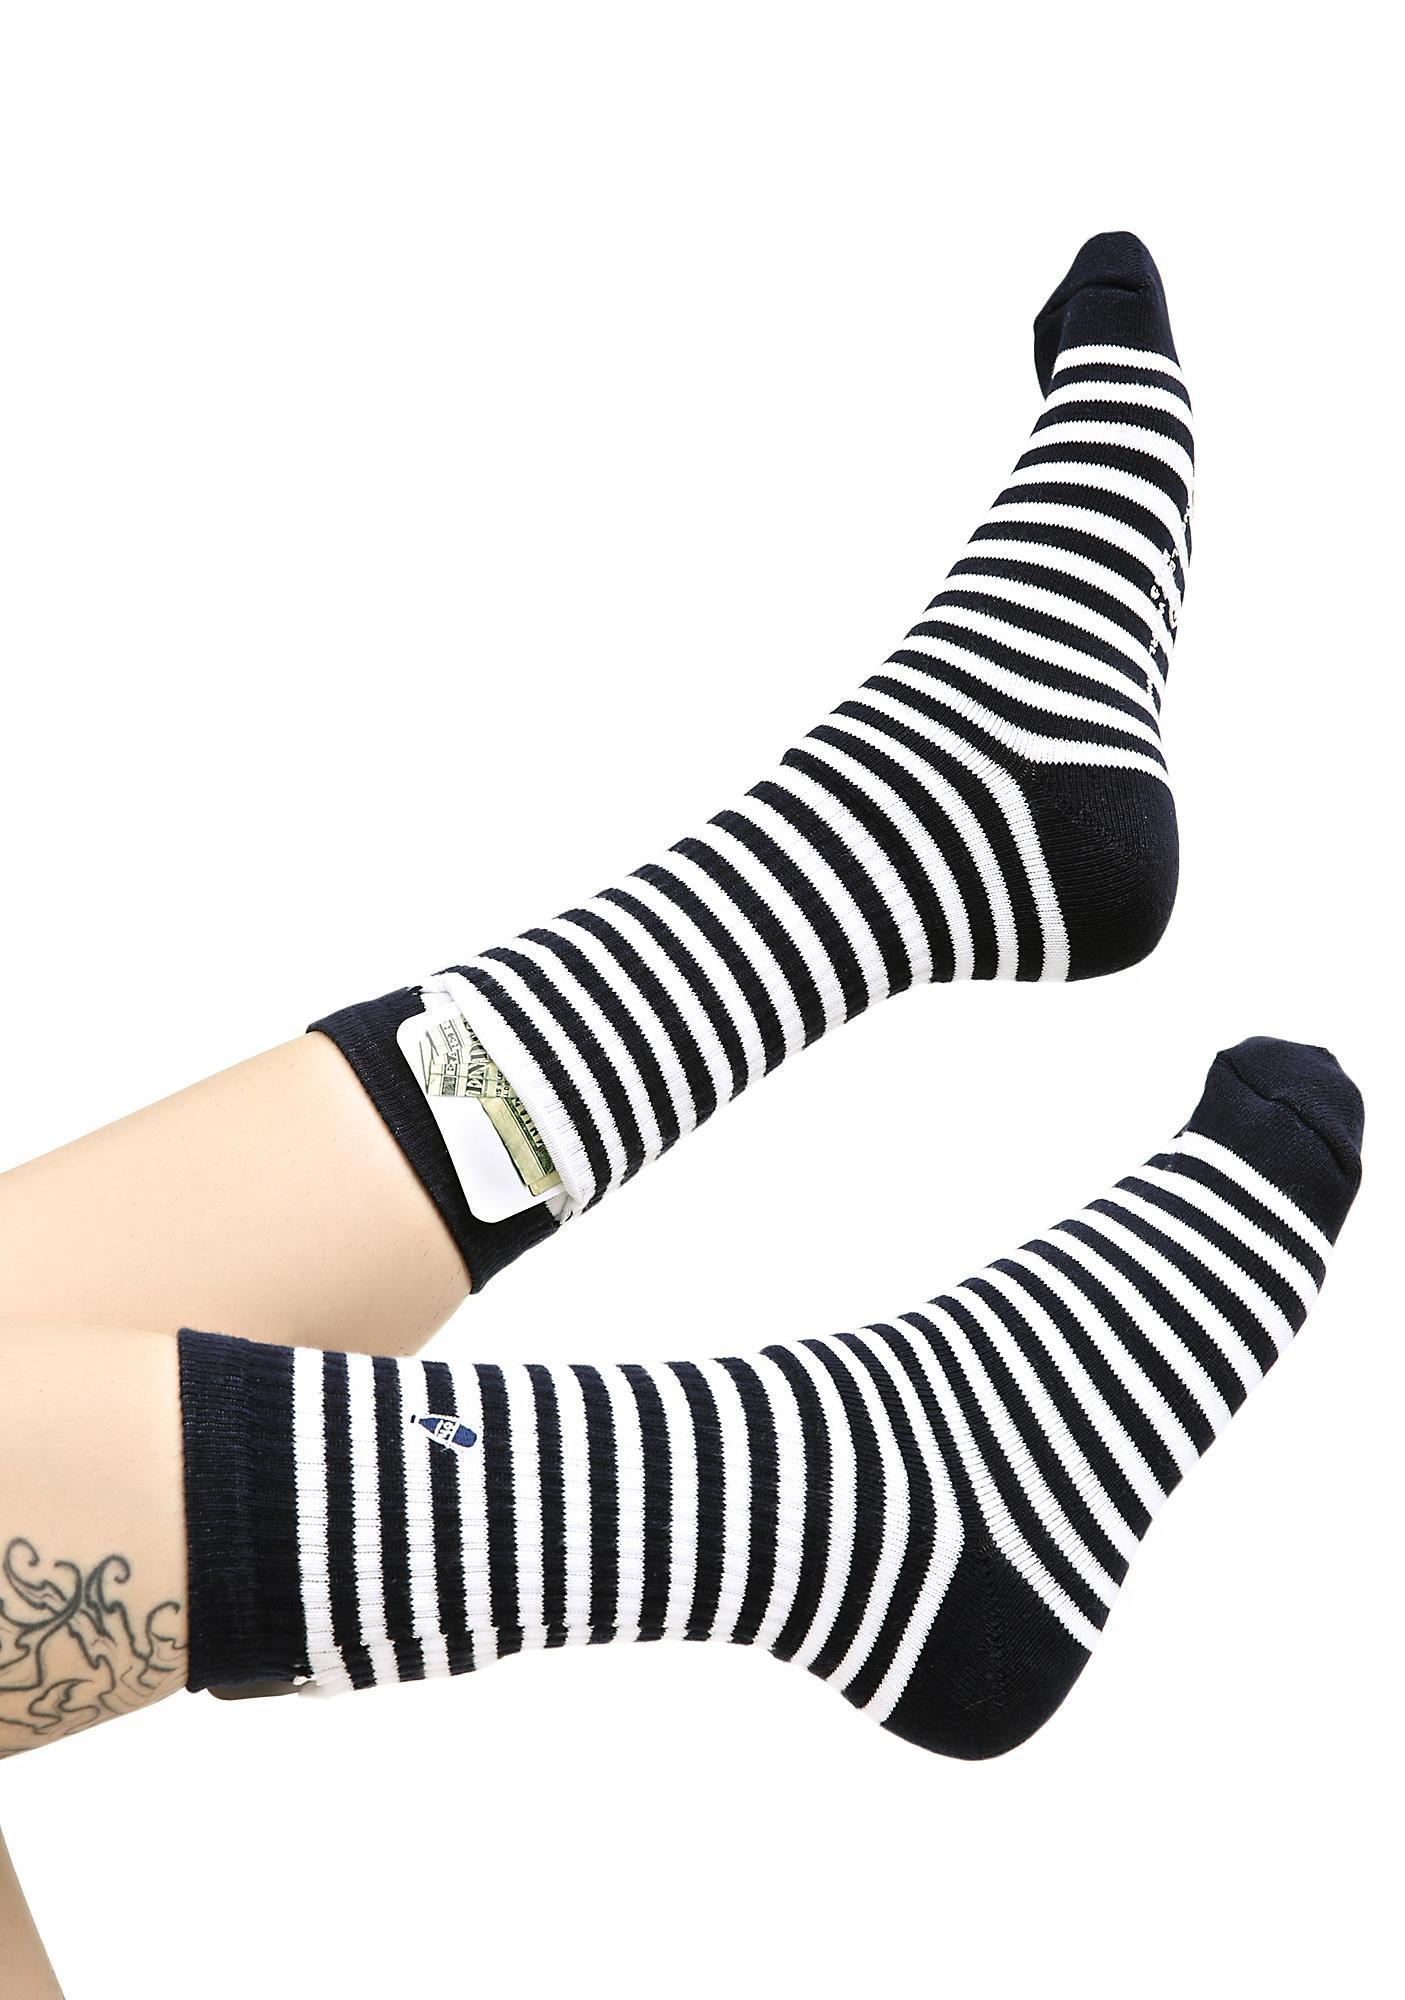 40s & Shorties Jackson Pocket Socks